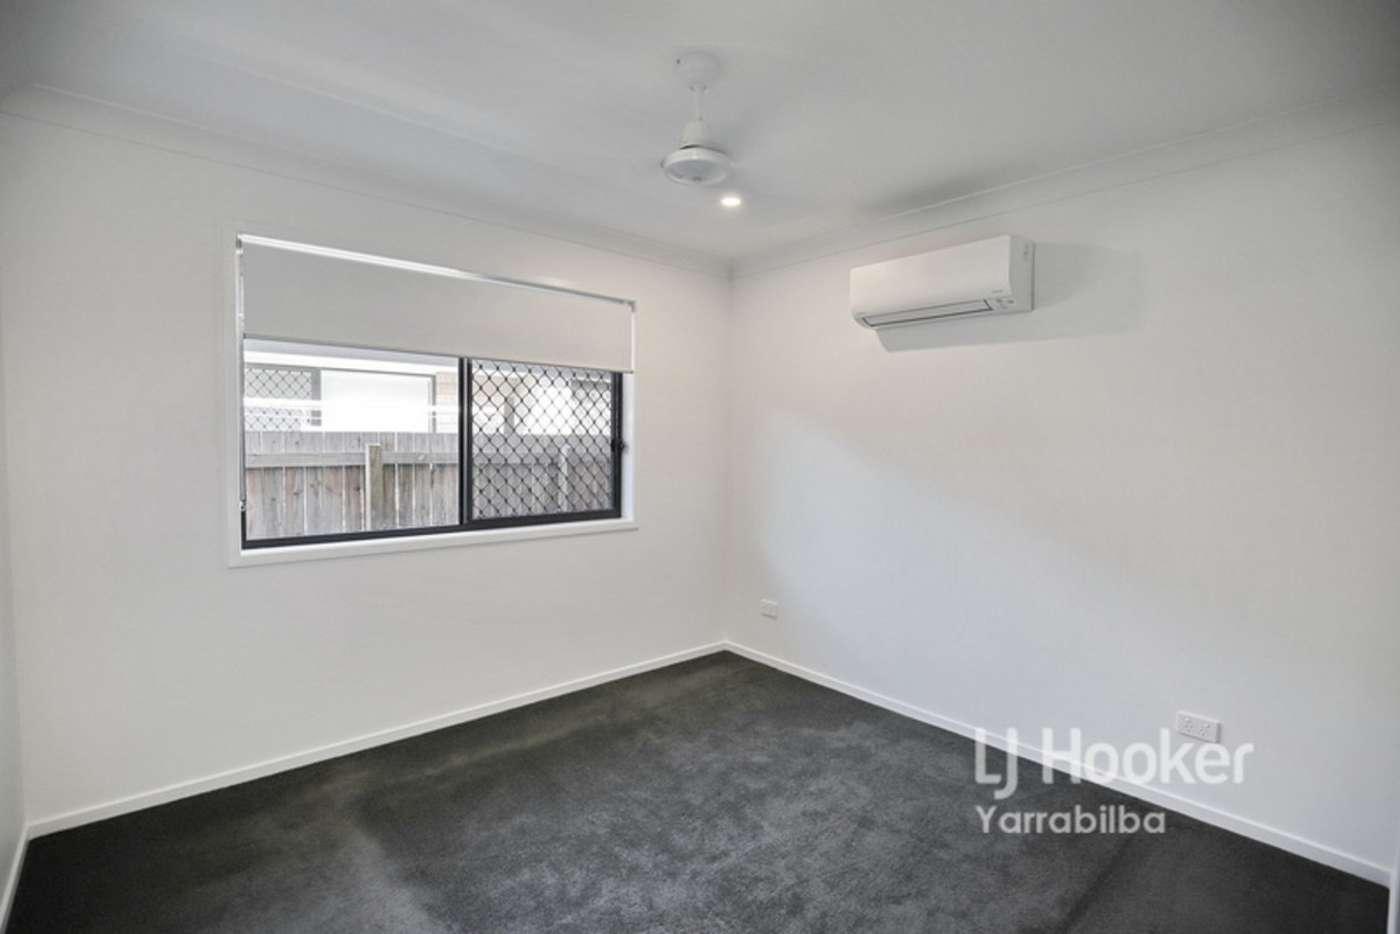 Sixth view of Homely house listing, 7 Harmony Street, Yarrabilba QLD 4207